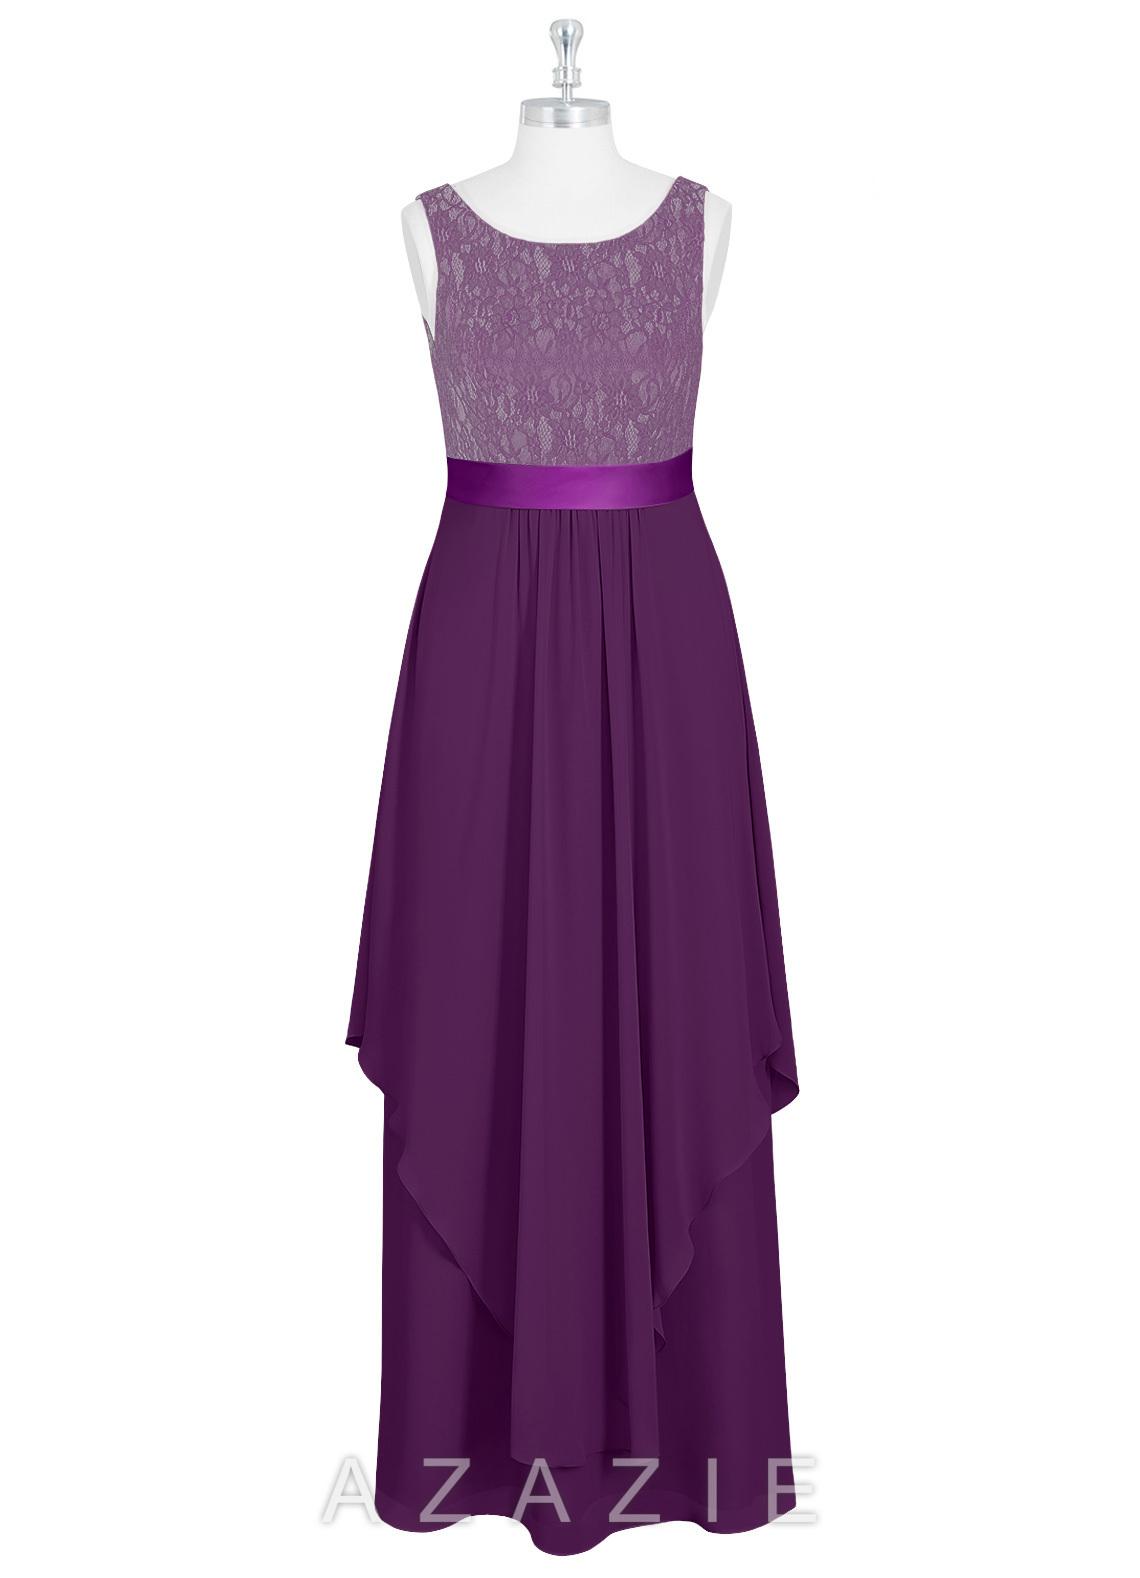 c8be3544537 Ella MBD Sample Dress. Loading zoom